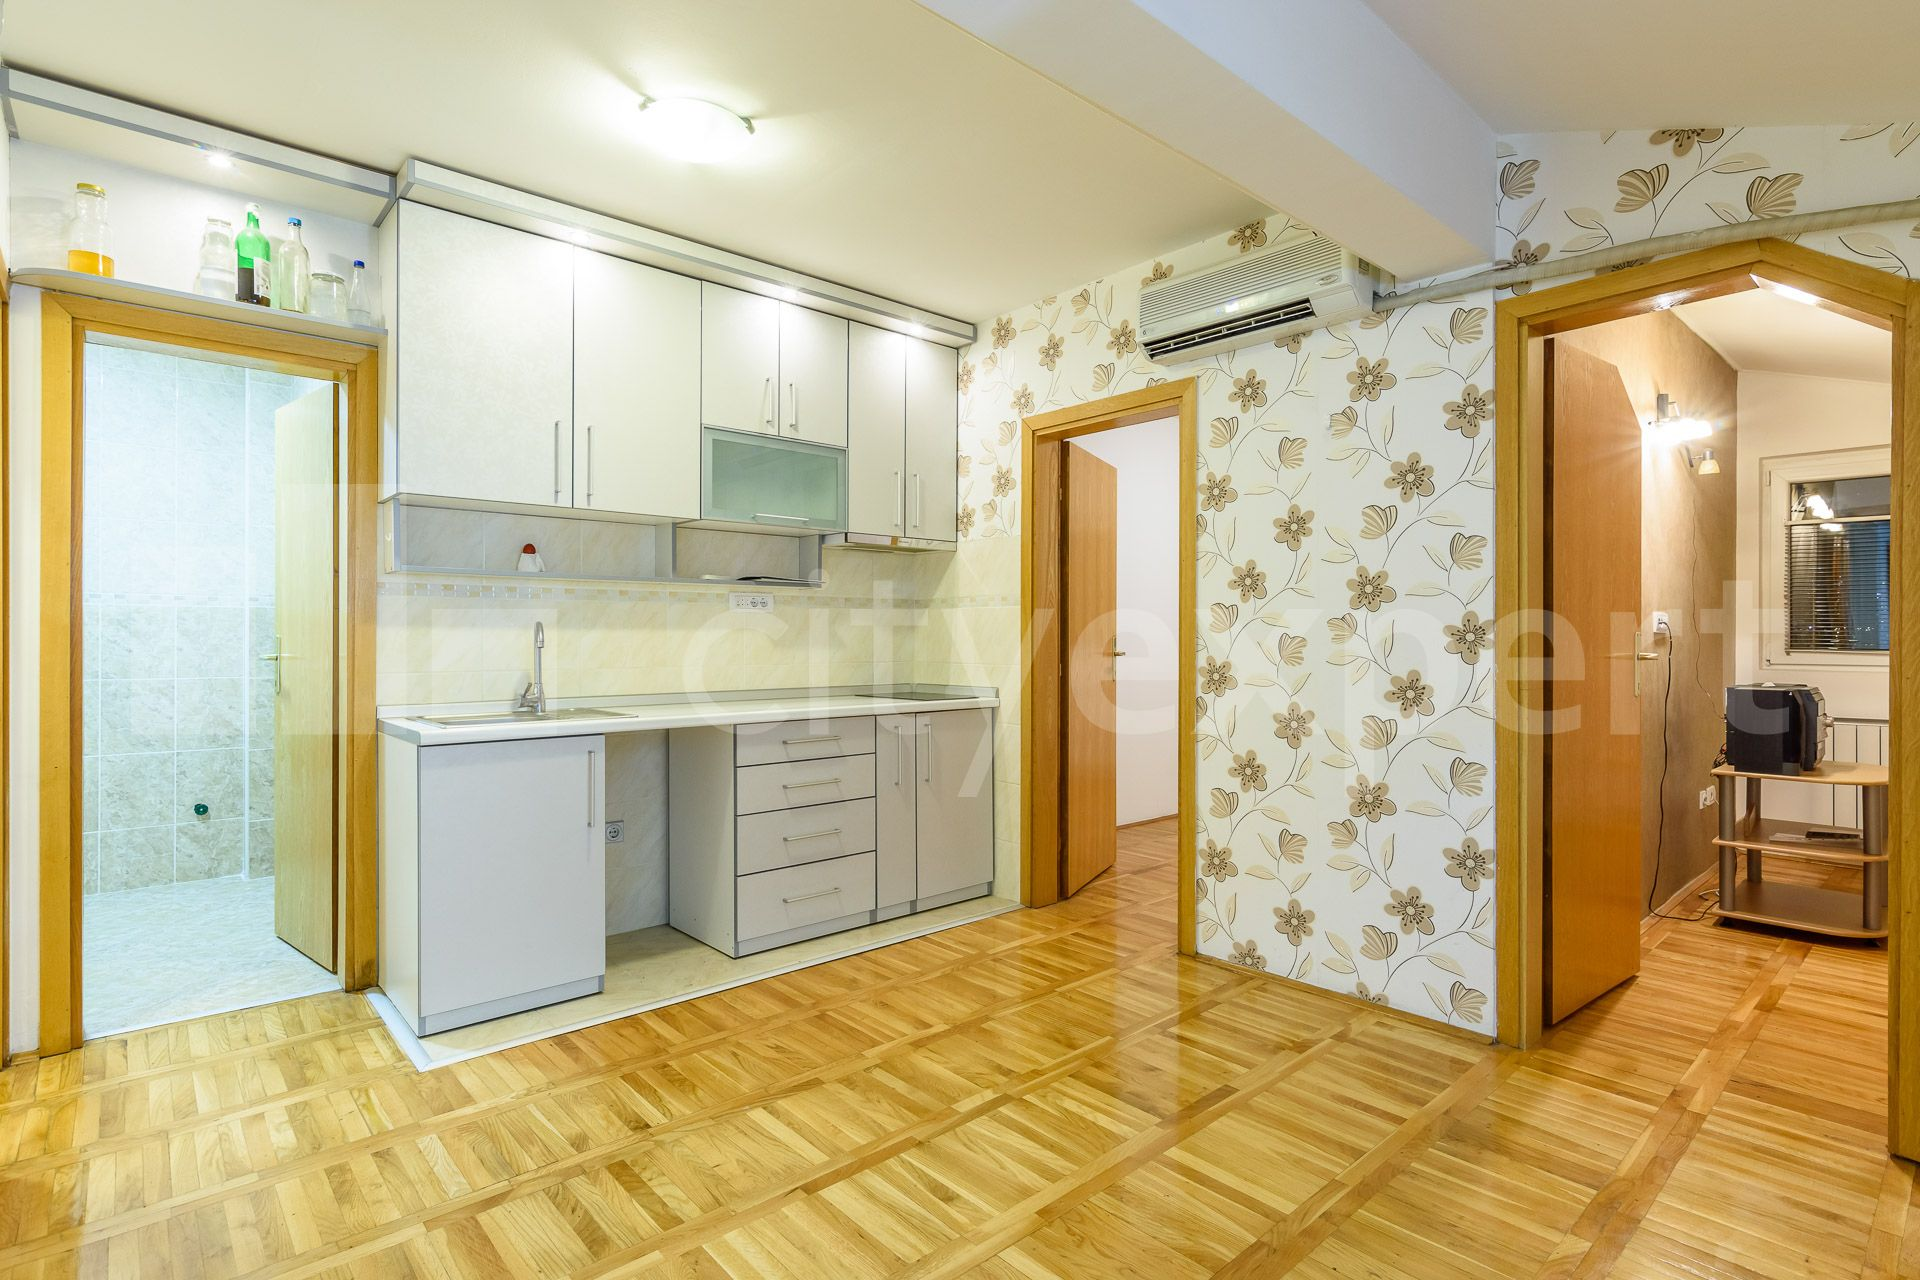 Sale Apartment Dragice Koncar Vozdovac Id 38510 Cityexpert